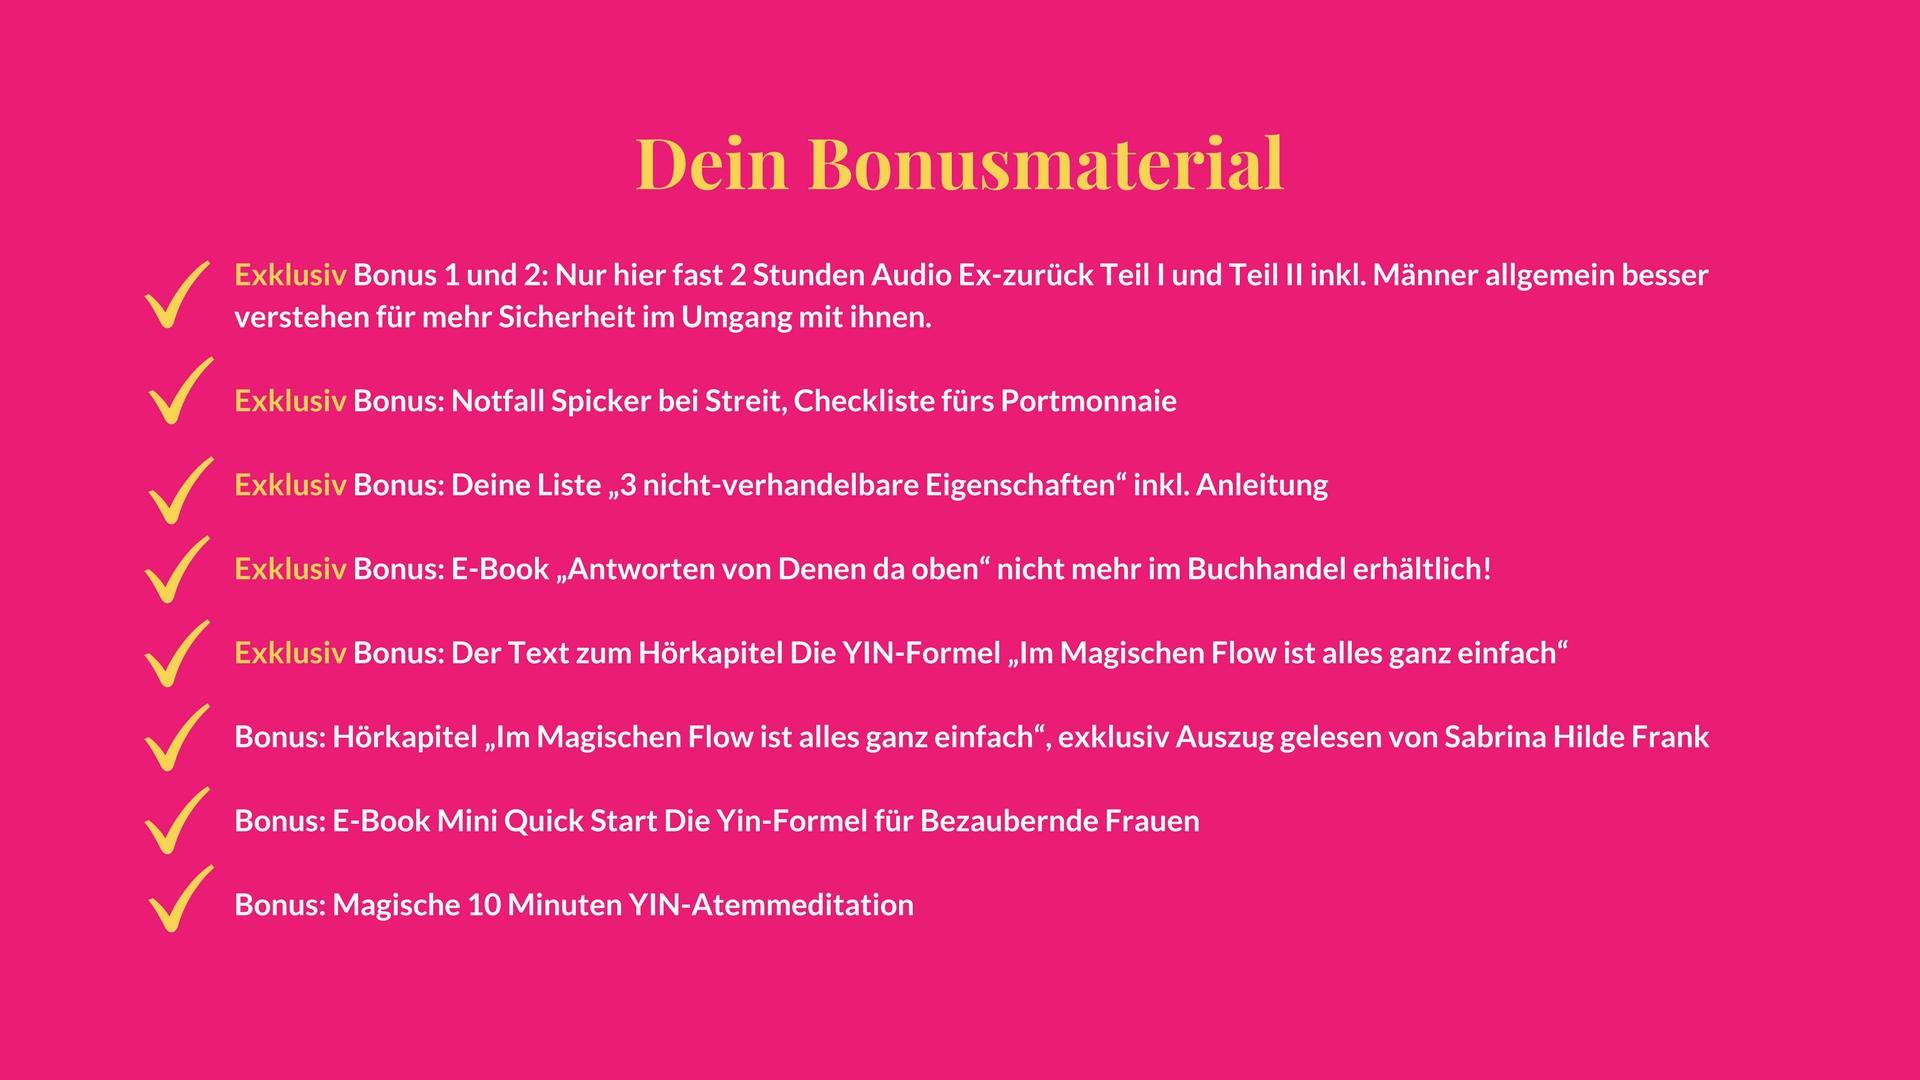 Textfeld Sales Page Bonusmaterial Checkmarks